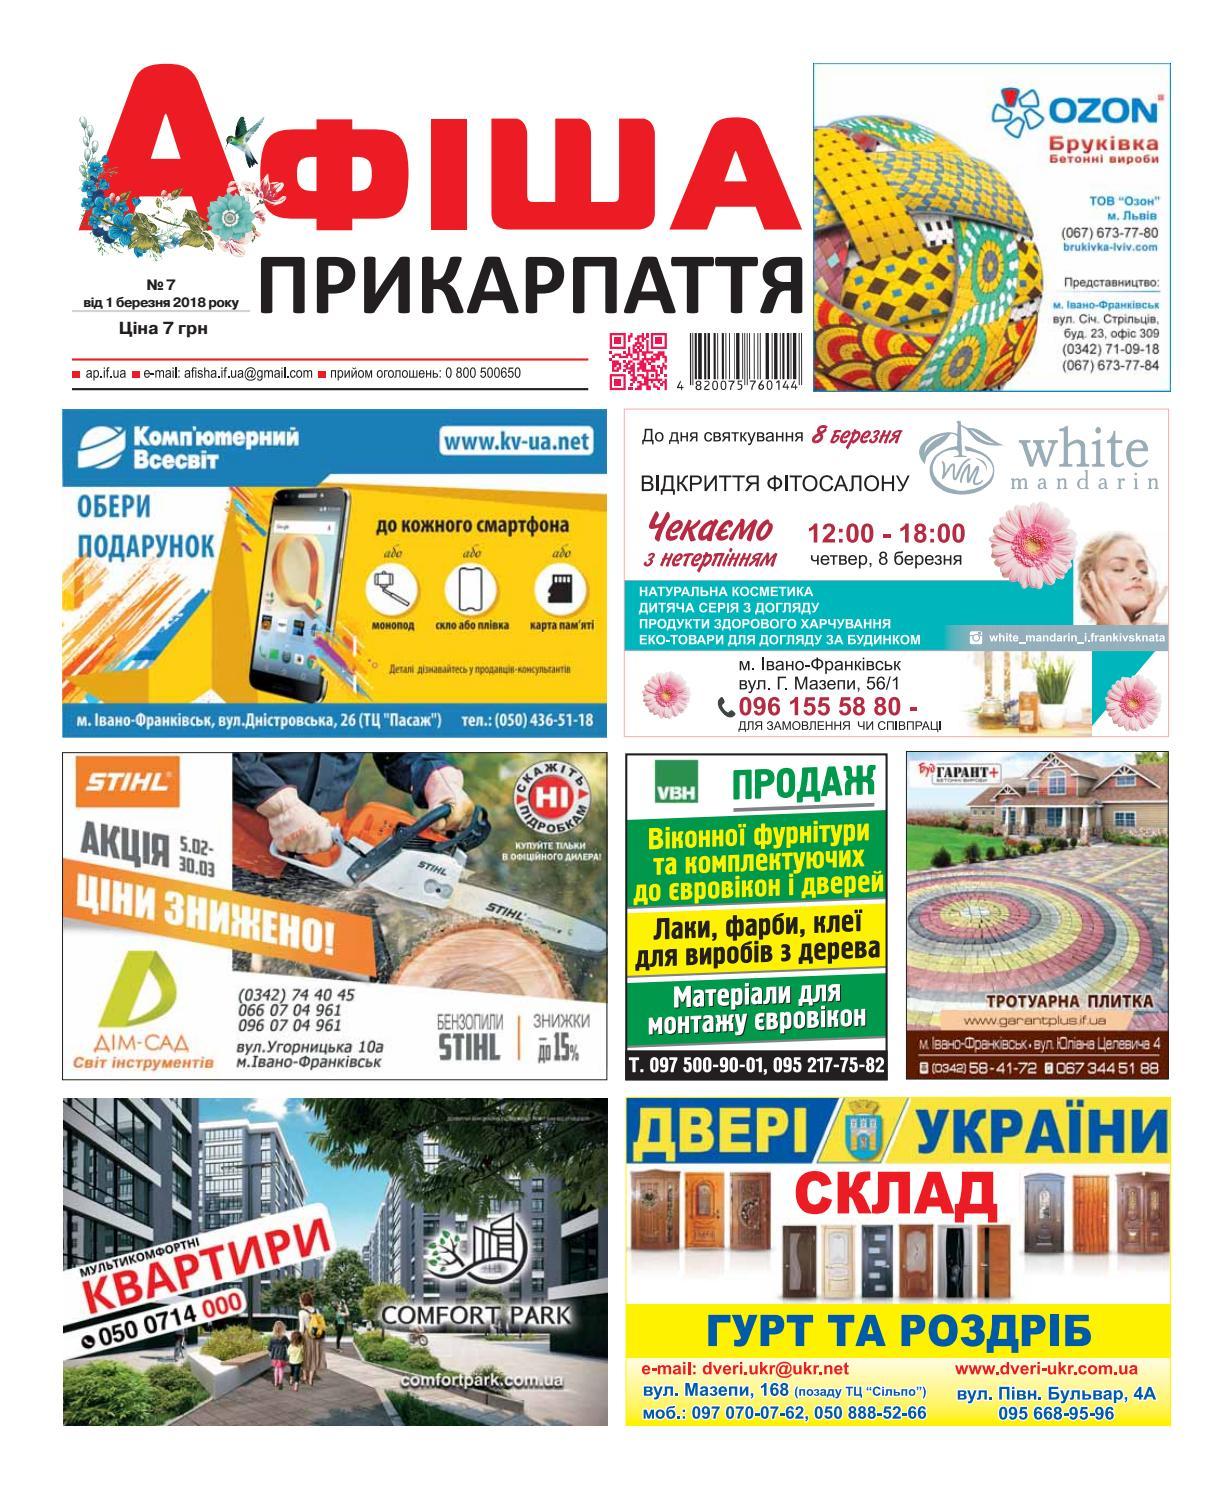 Афіша Прикарпаття 7 by Olya Olya - issuu ec126029302ea